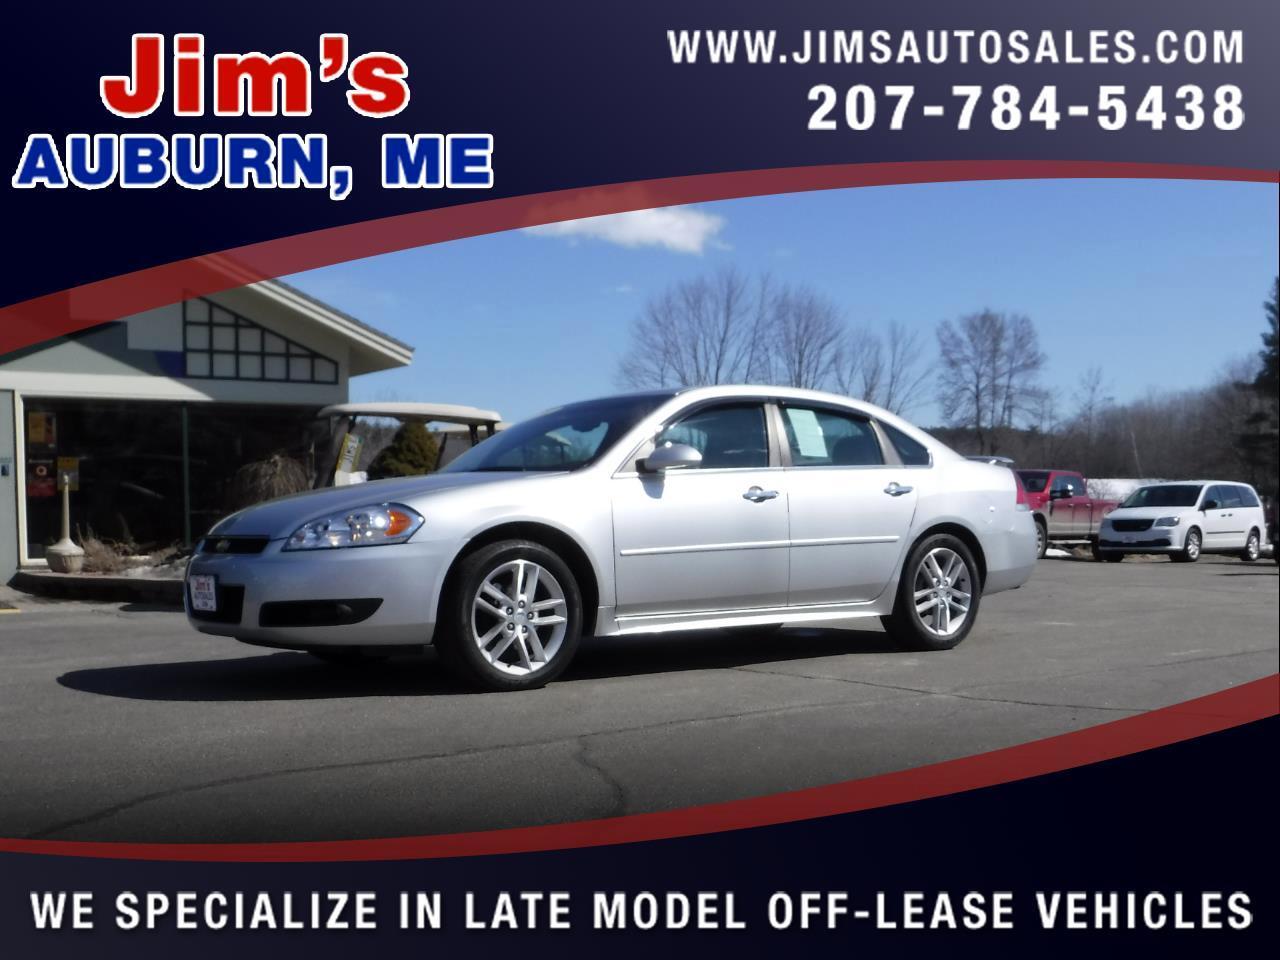 2012 Chevrolet Impala 4dr Sdn LTZ